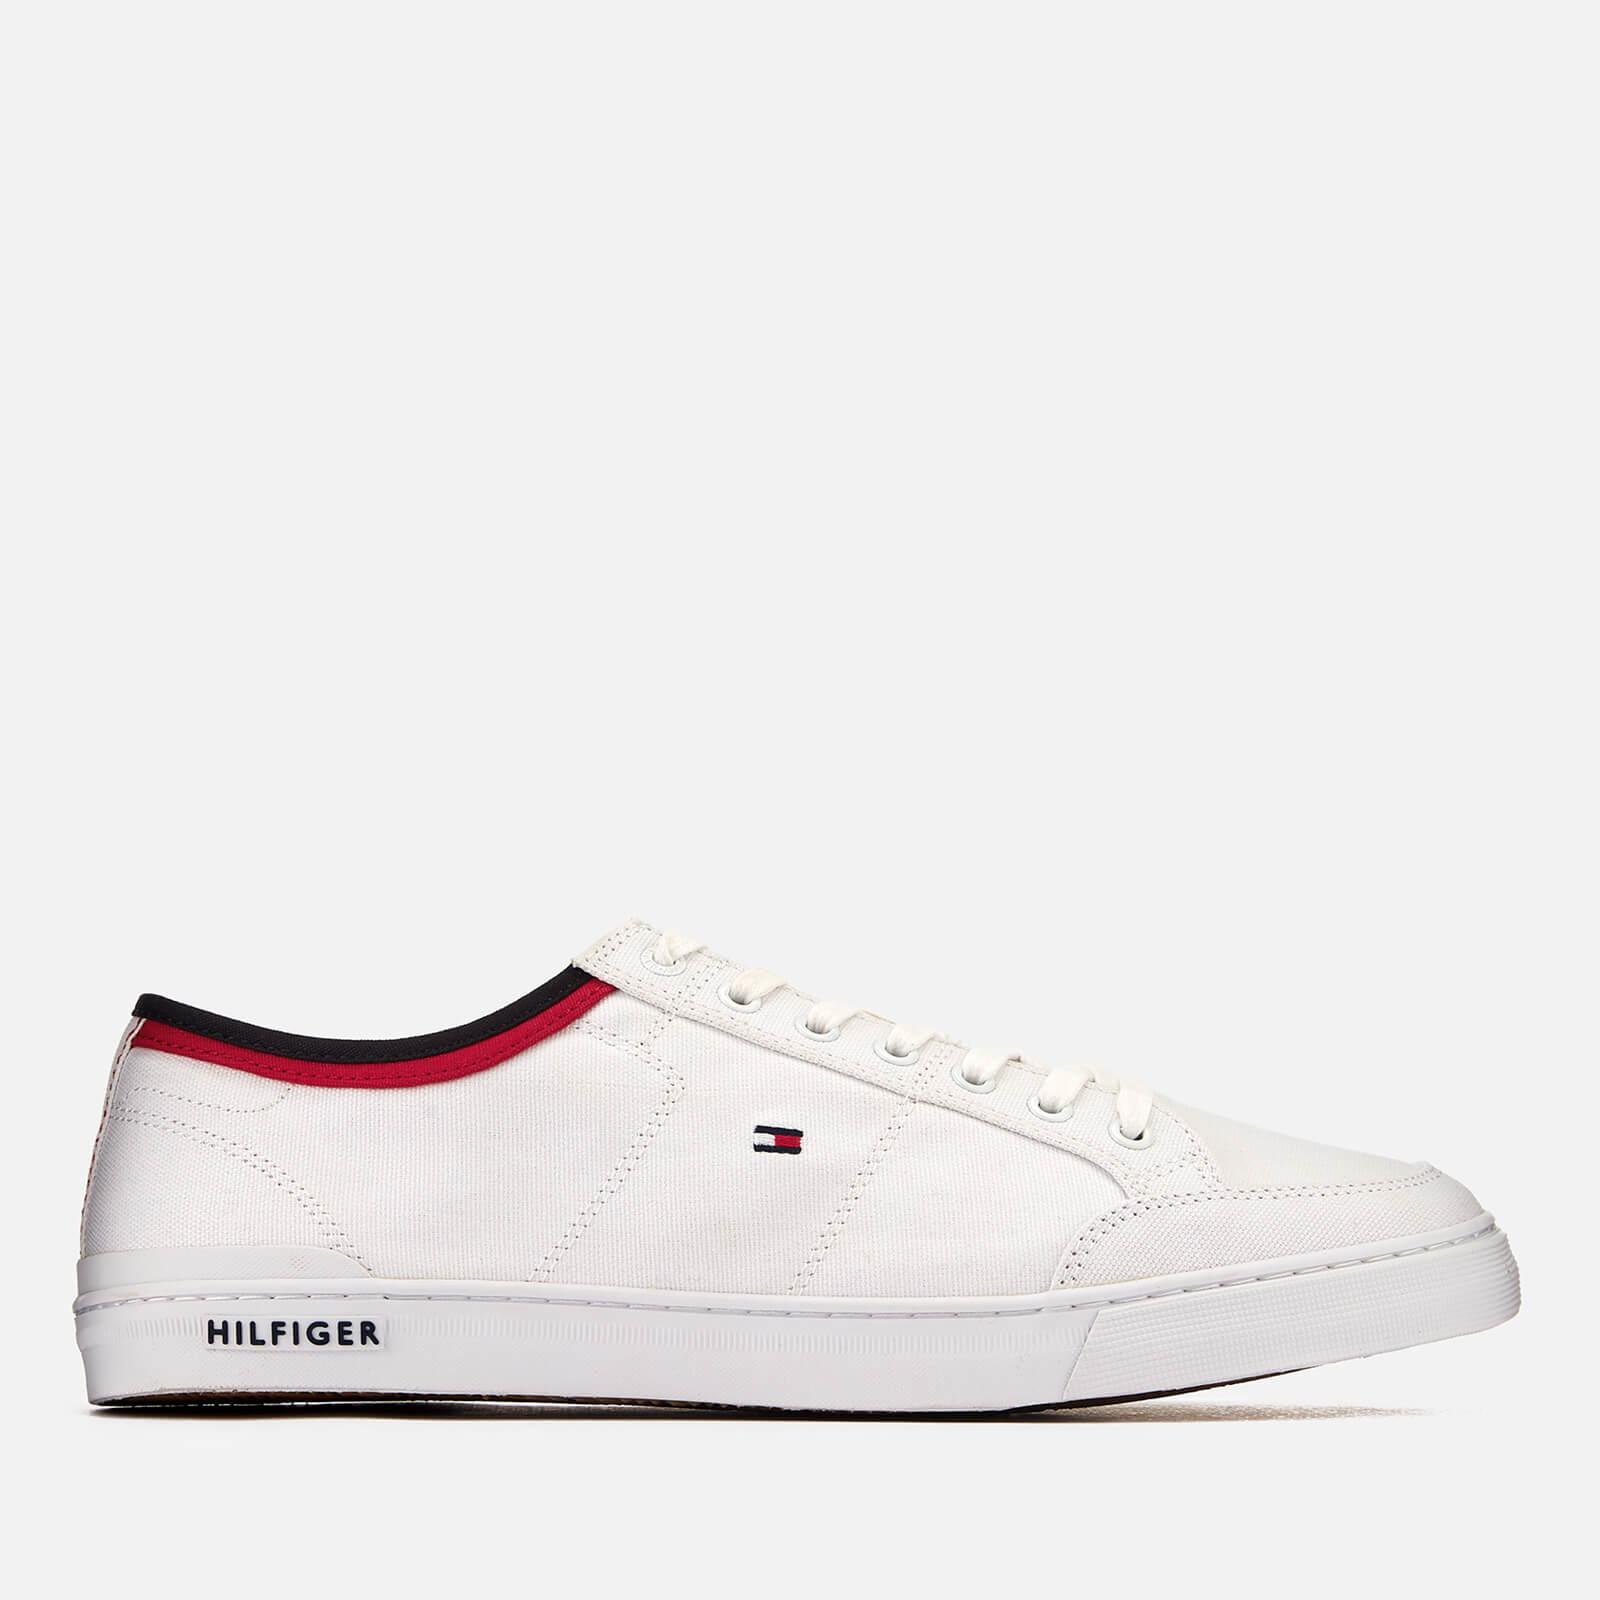 77548df5c349 Tommy Hilfiger Men s Core Corporate Canvas Trainers - White Mens Footwear